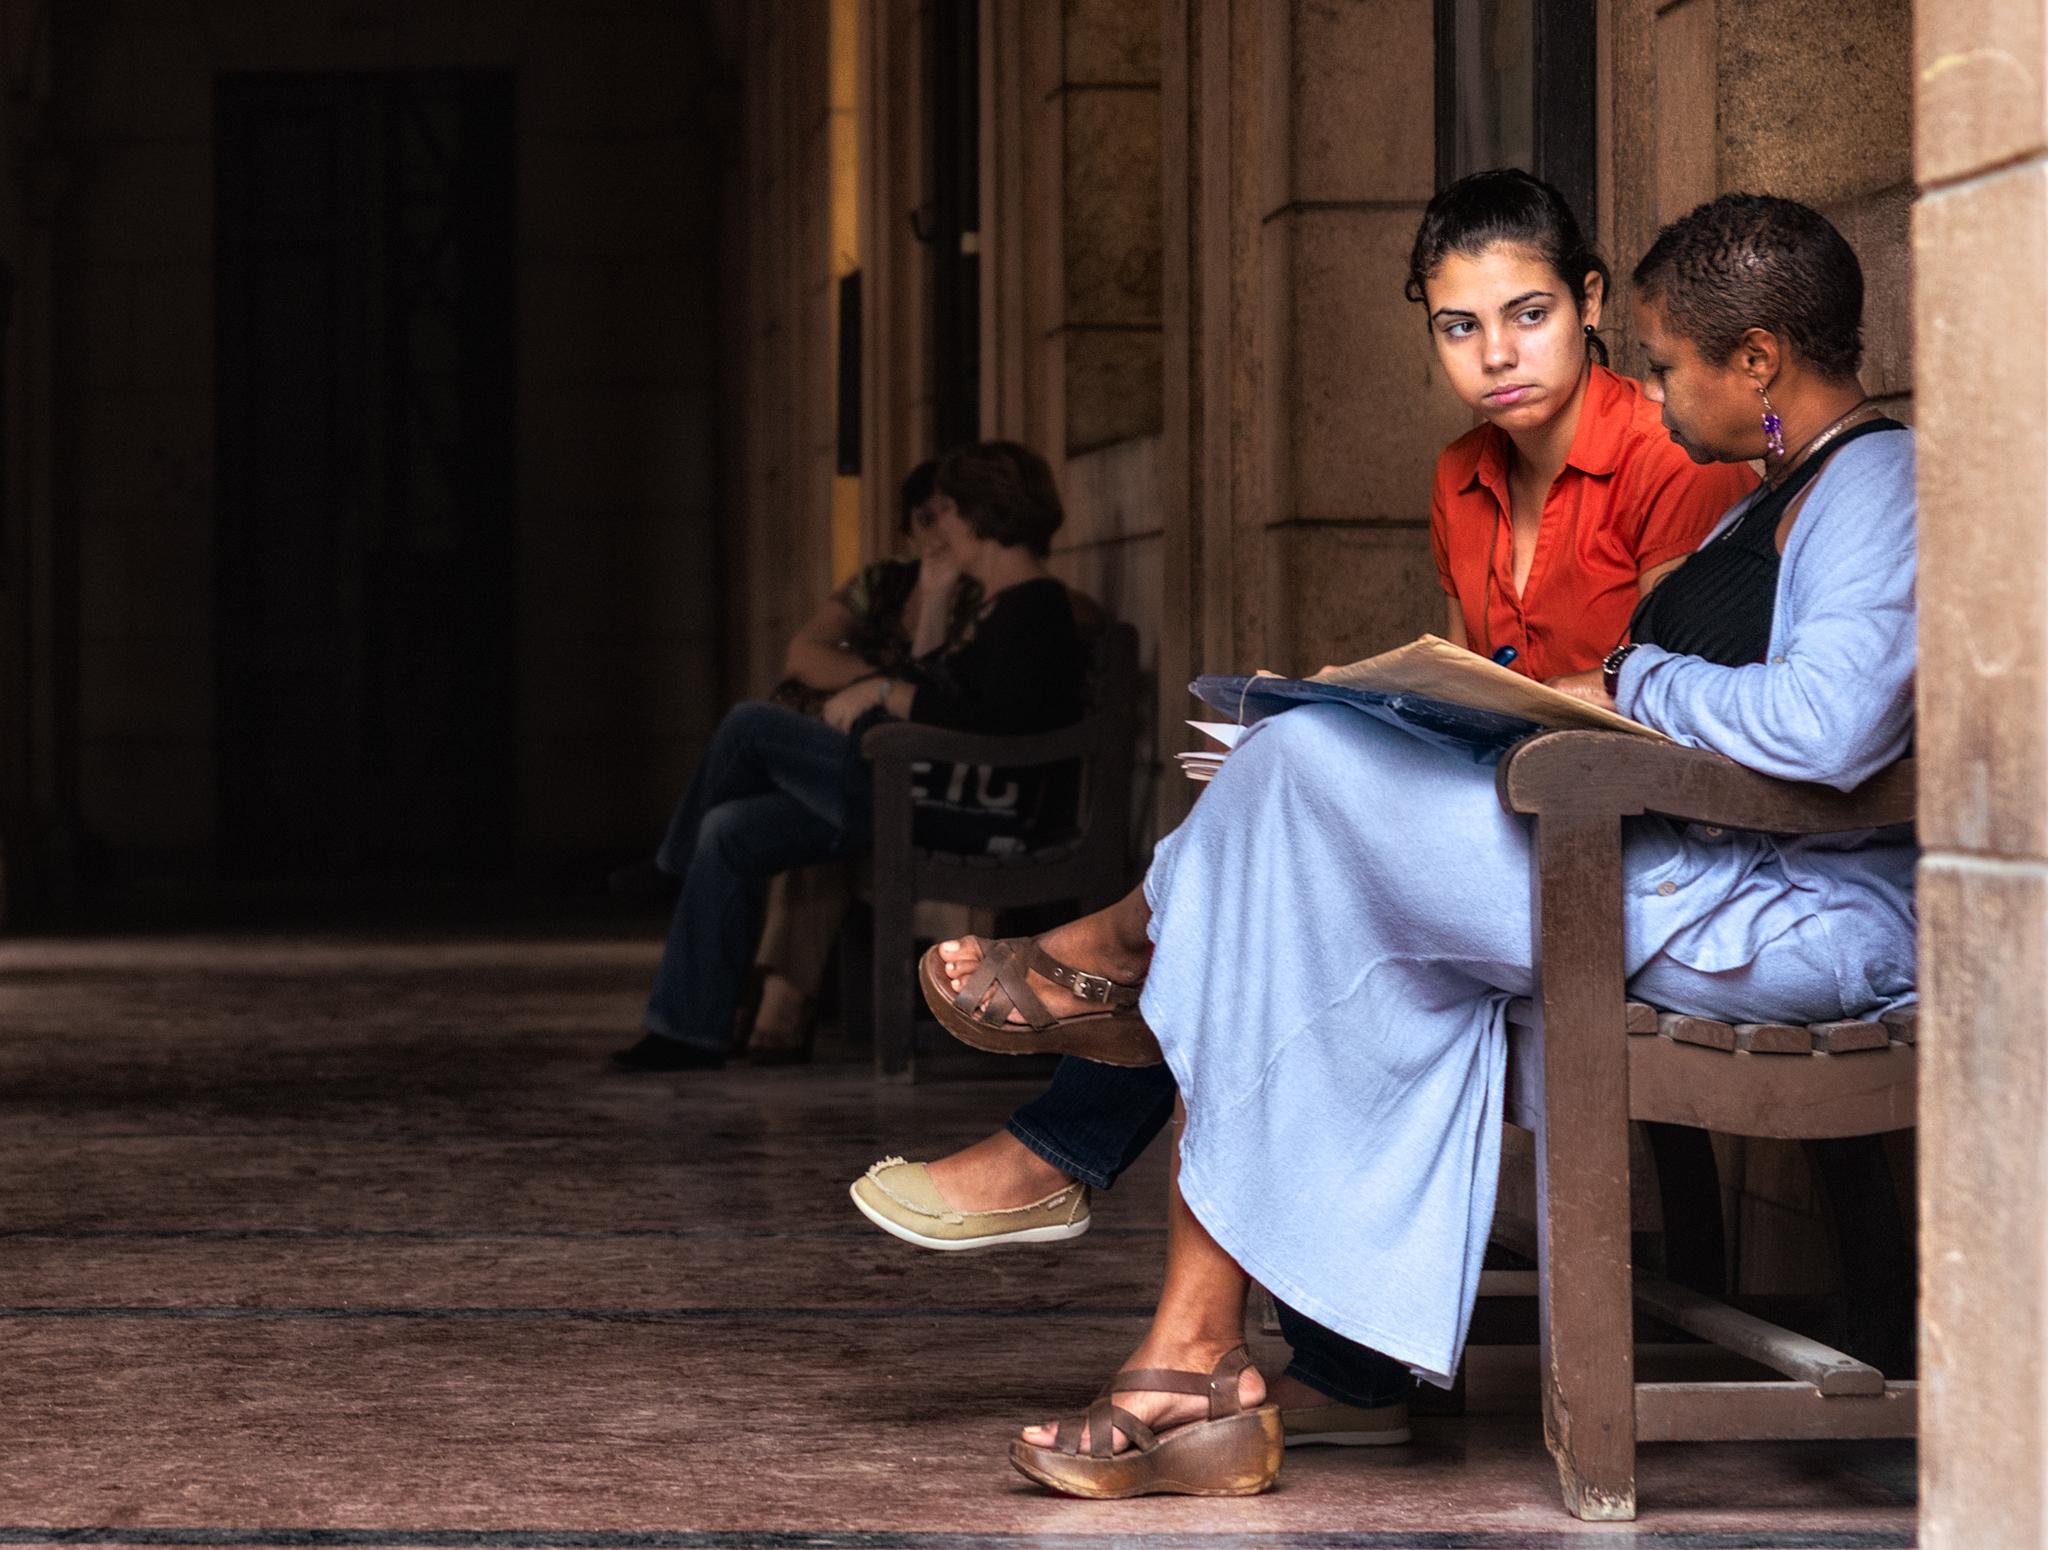 Learning - University of Havana - 2013